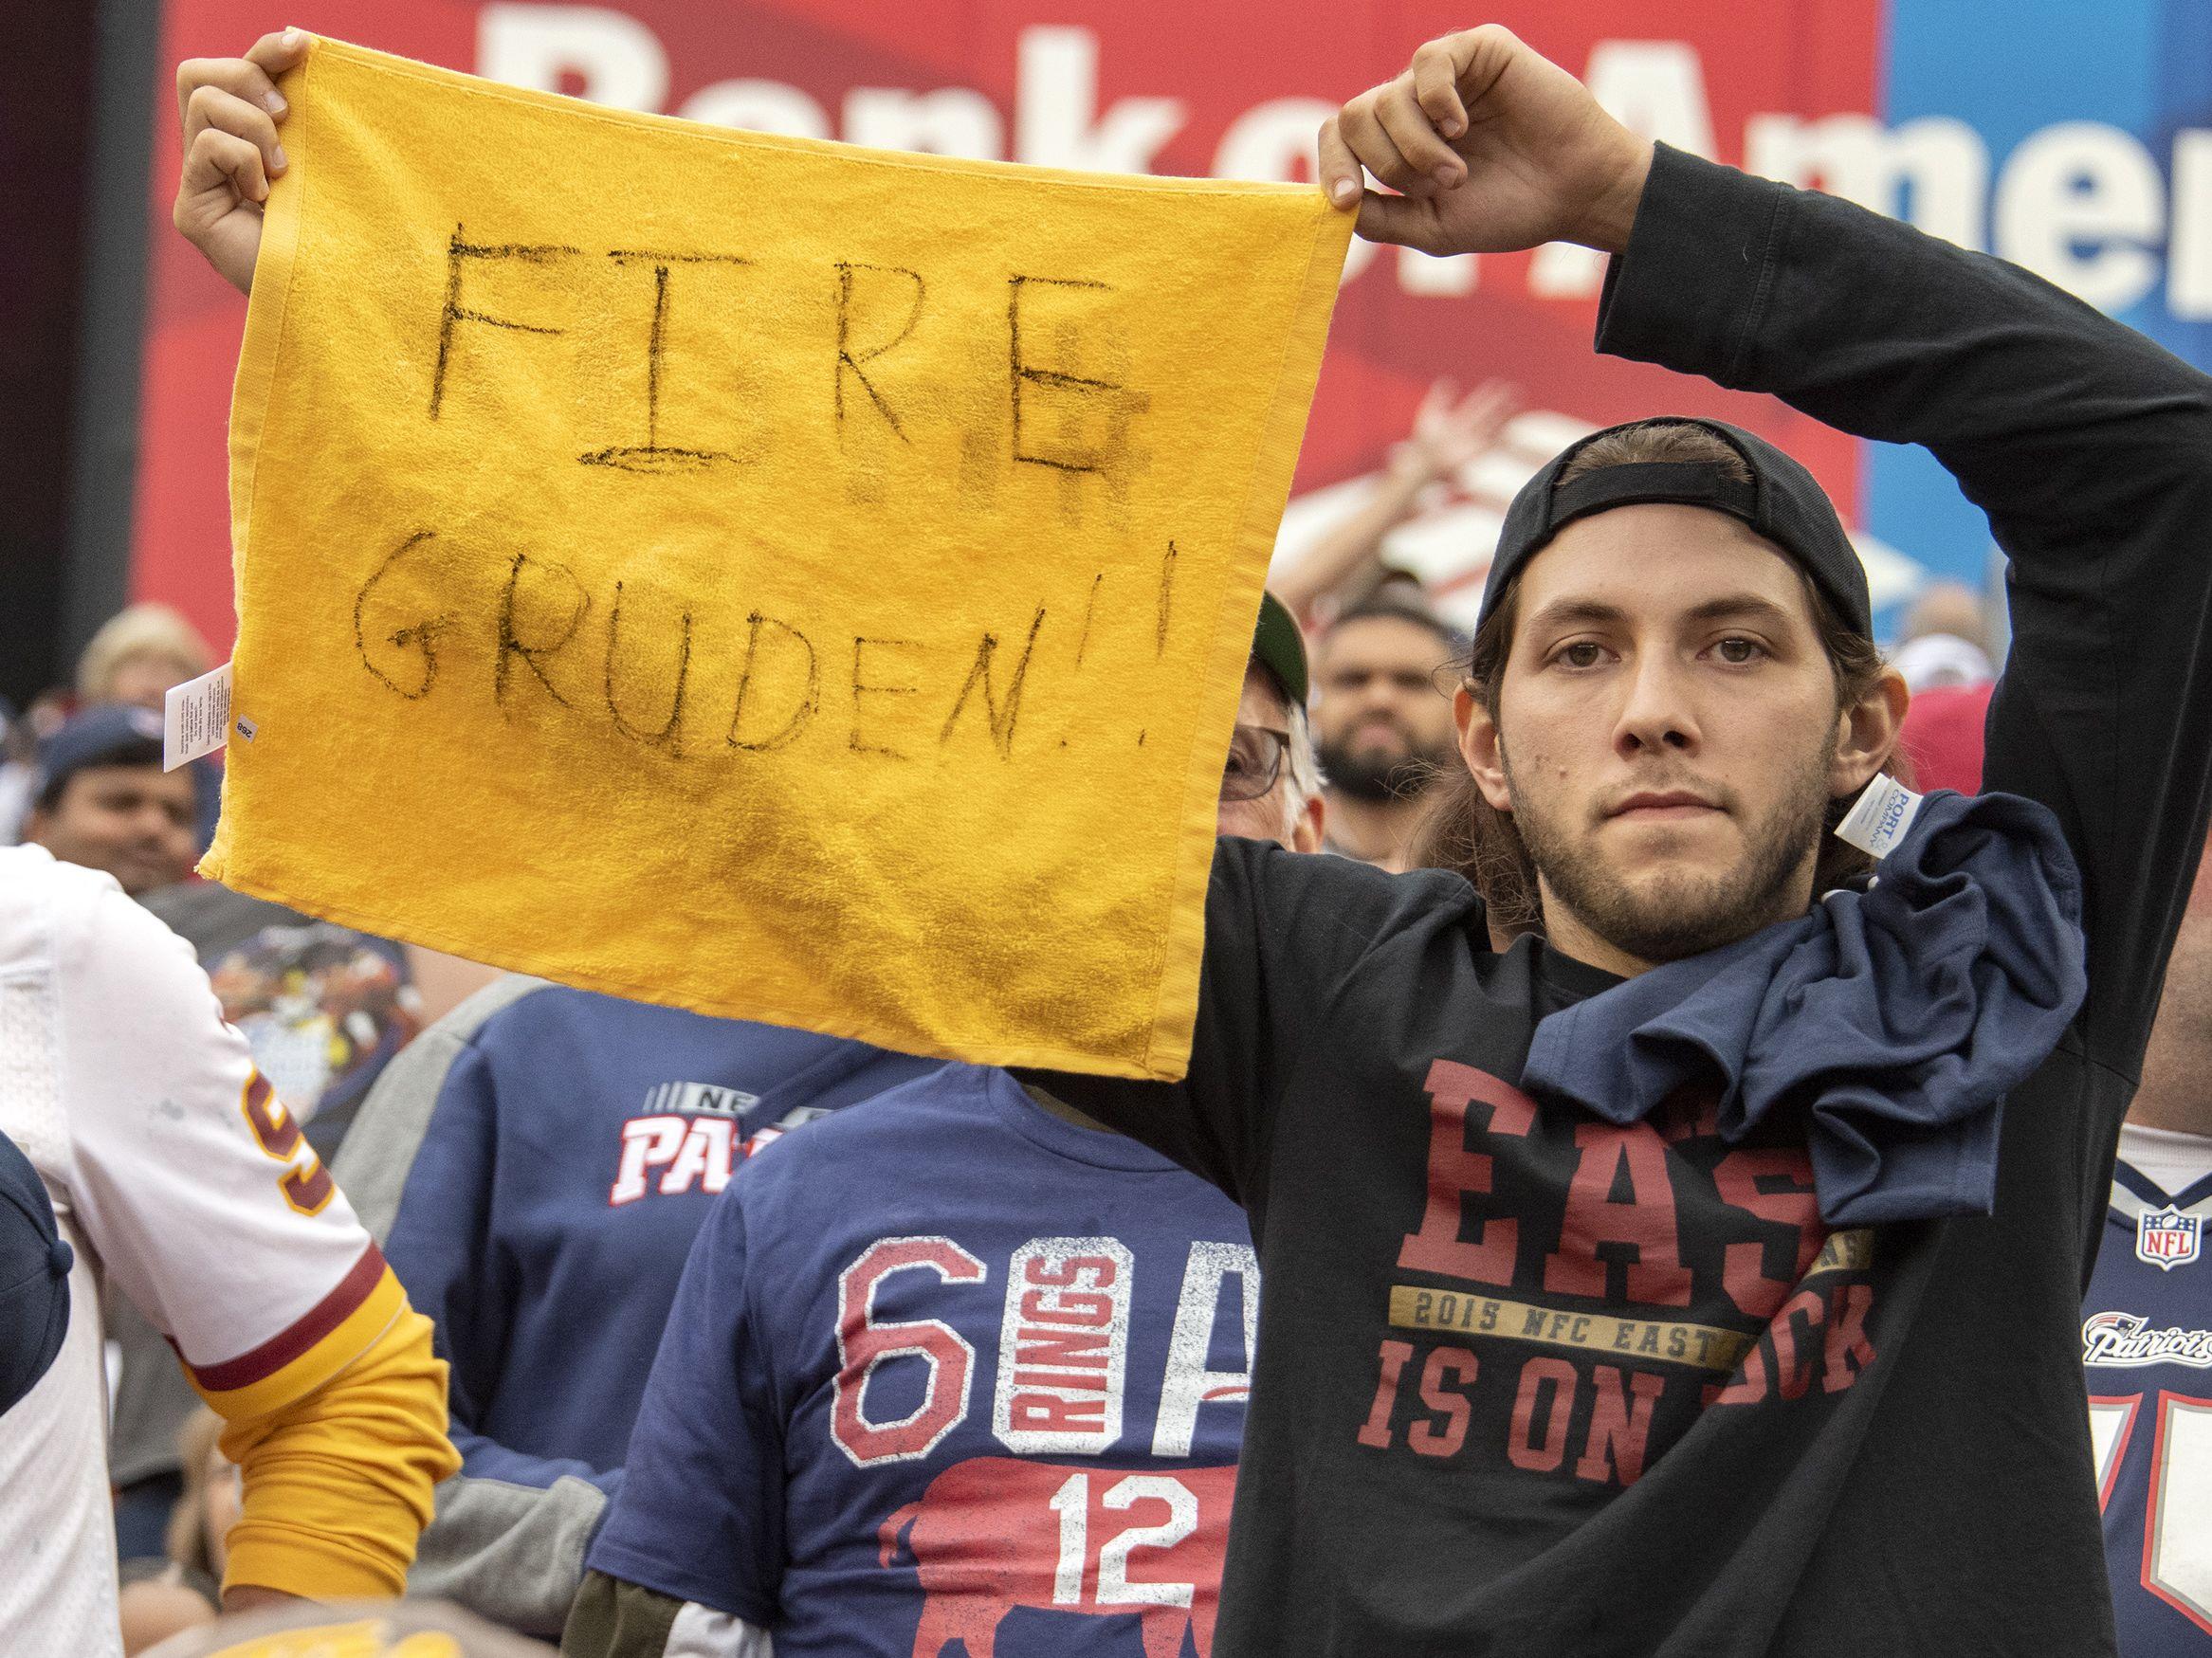 Fan der Washington Redskins